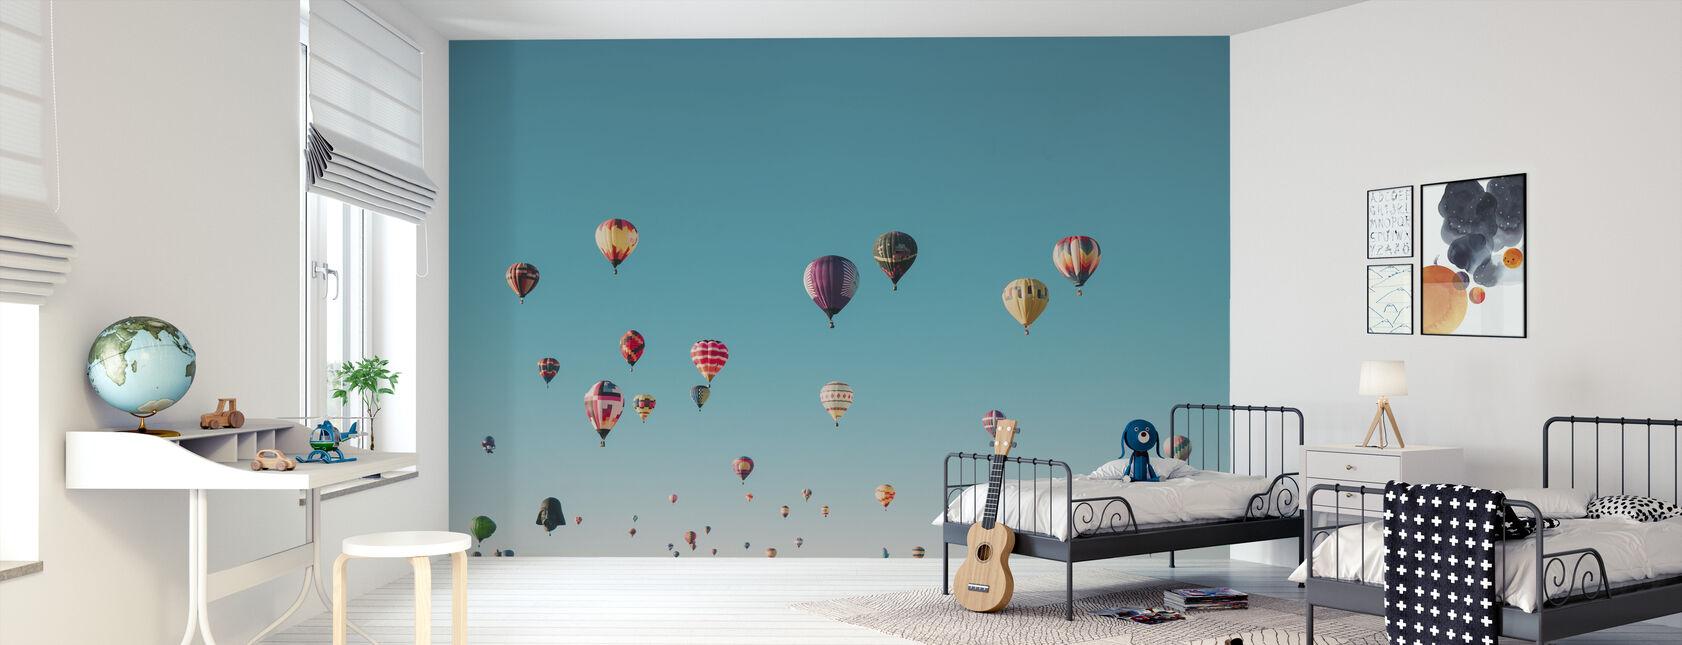 Hot Air Balloons - Wallpaper - Kids Room